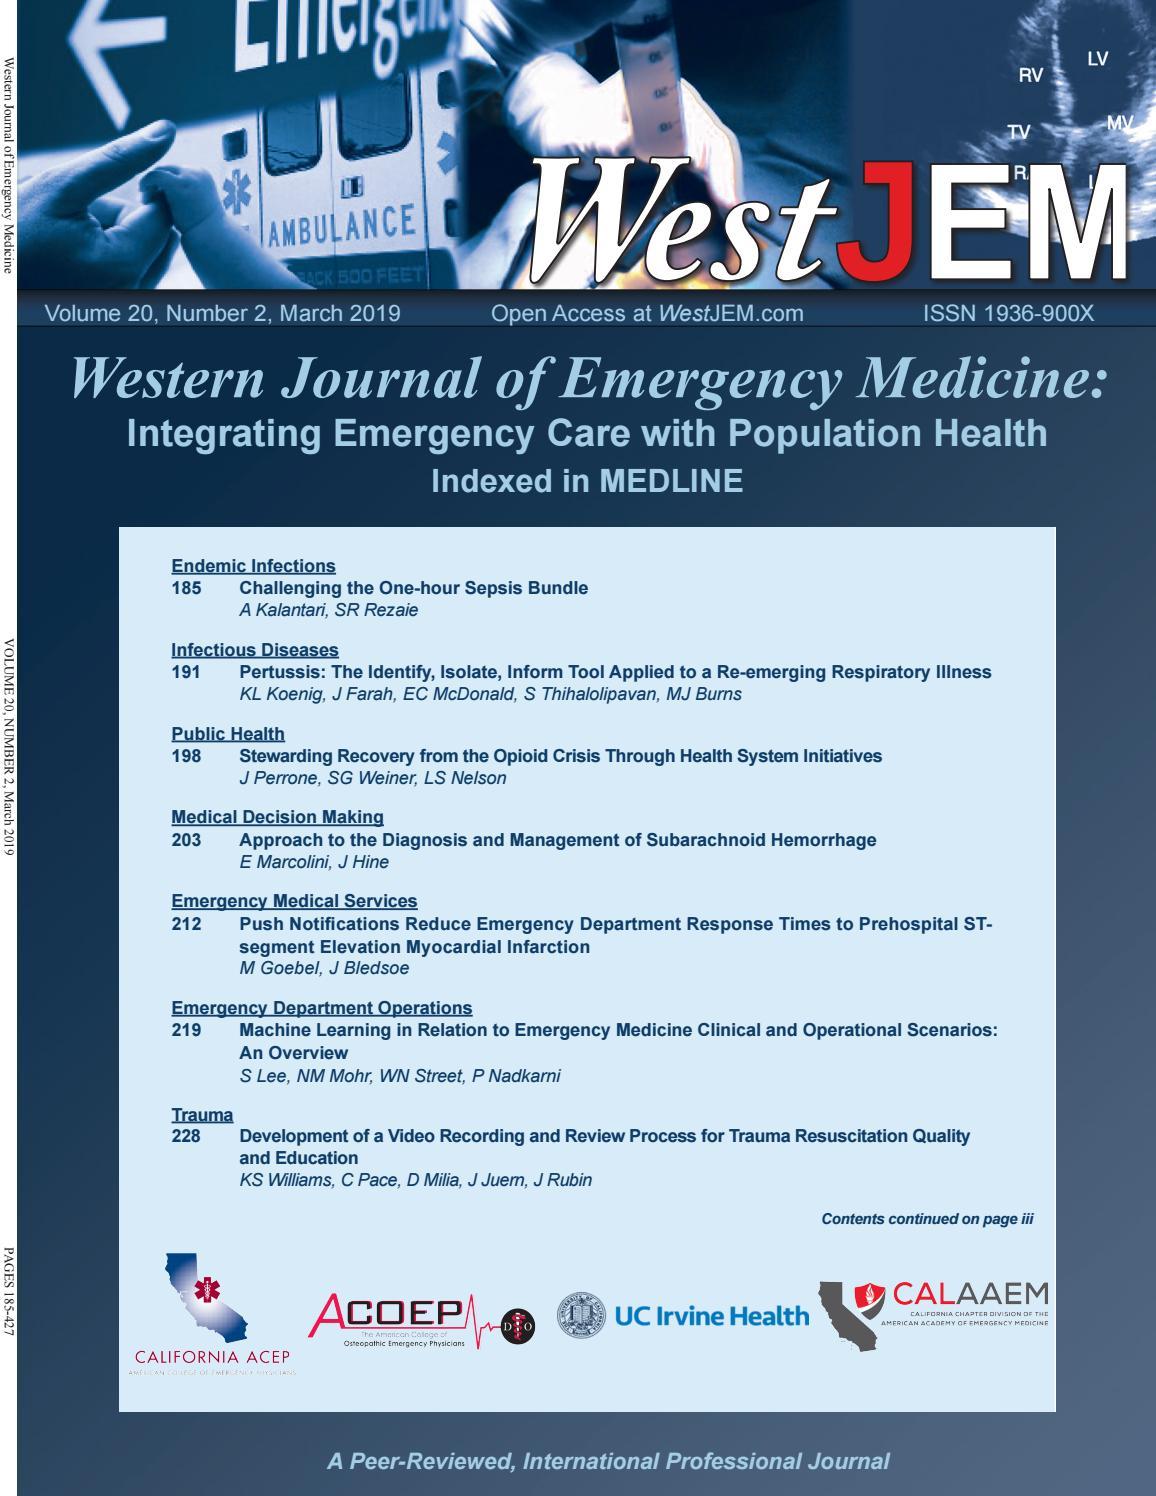 Volume 20 Issue 2 by Western Journal of Emergency Medicine